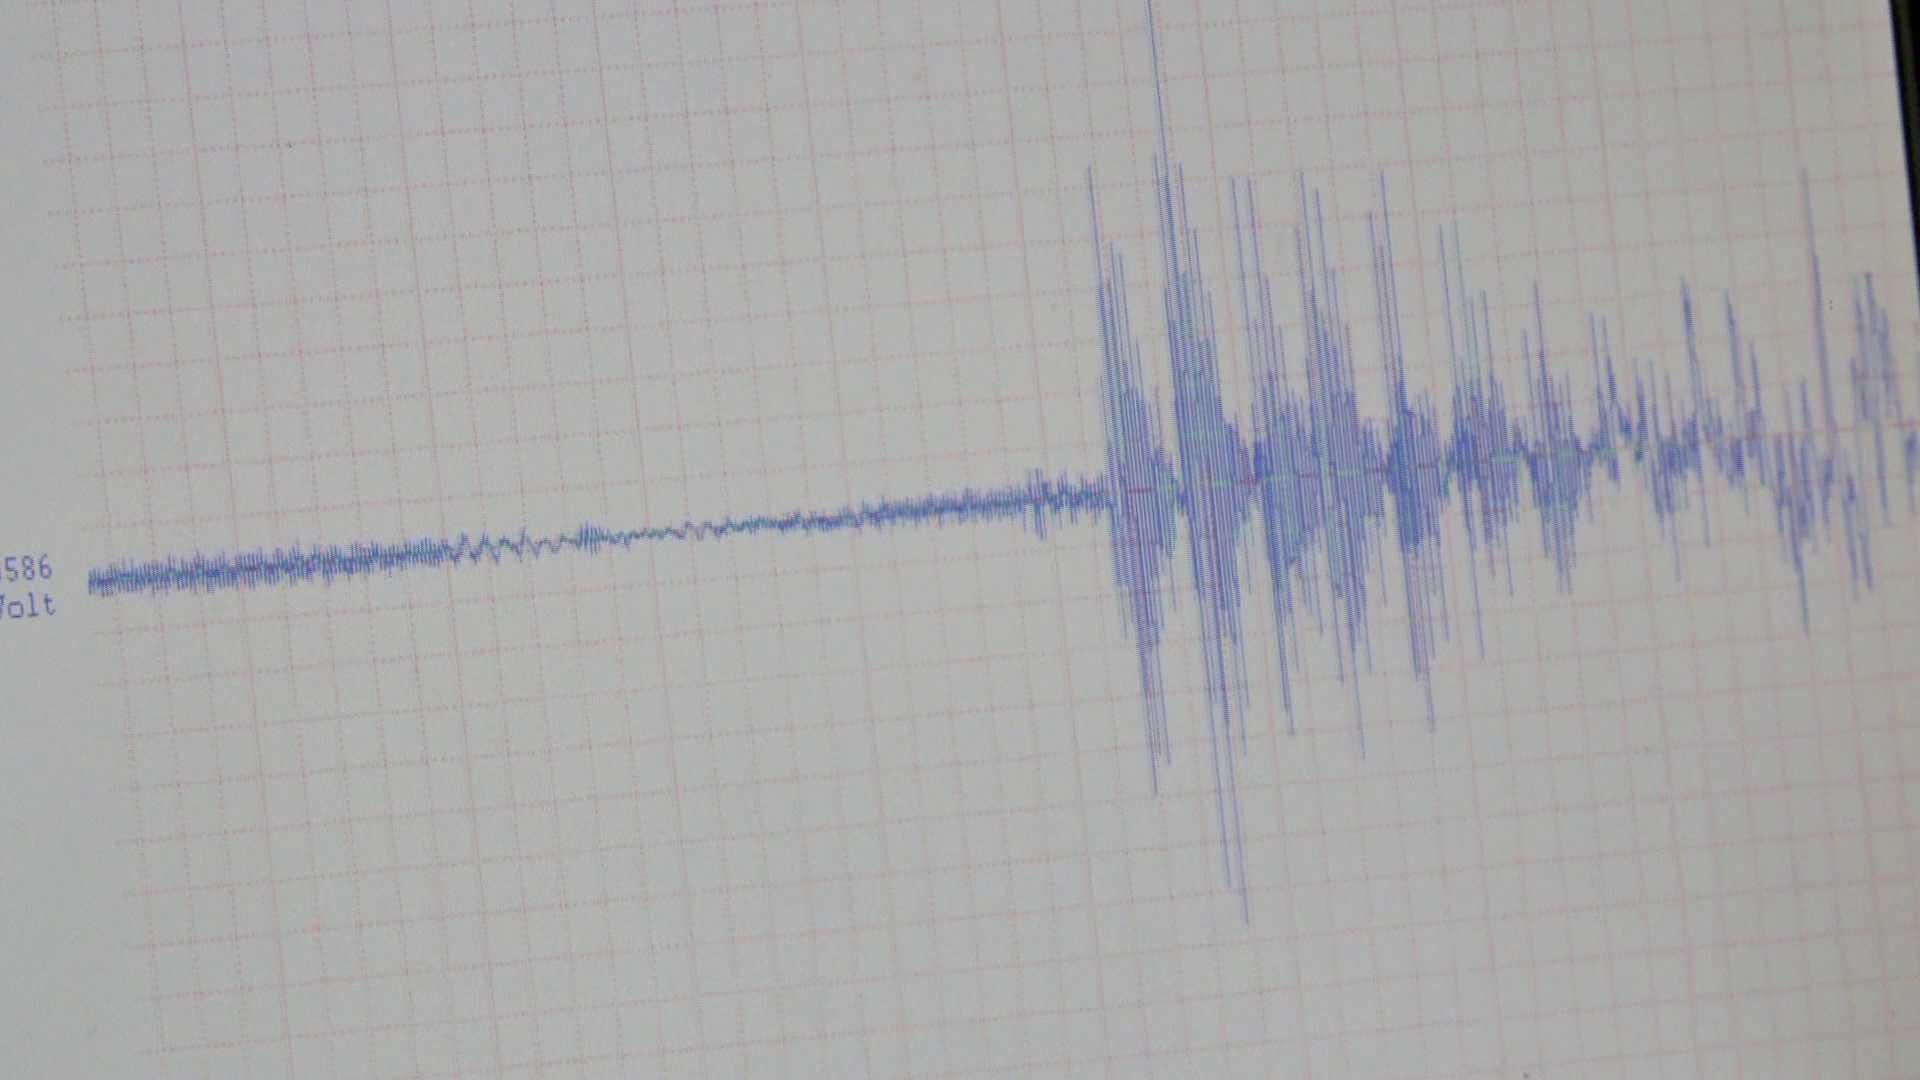 Earthquake lines